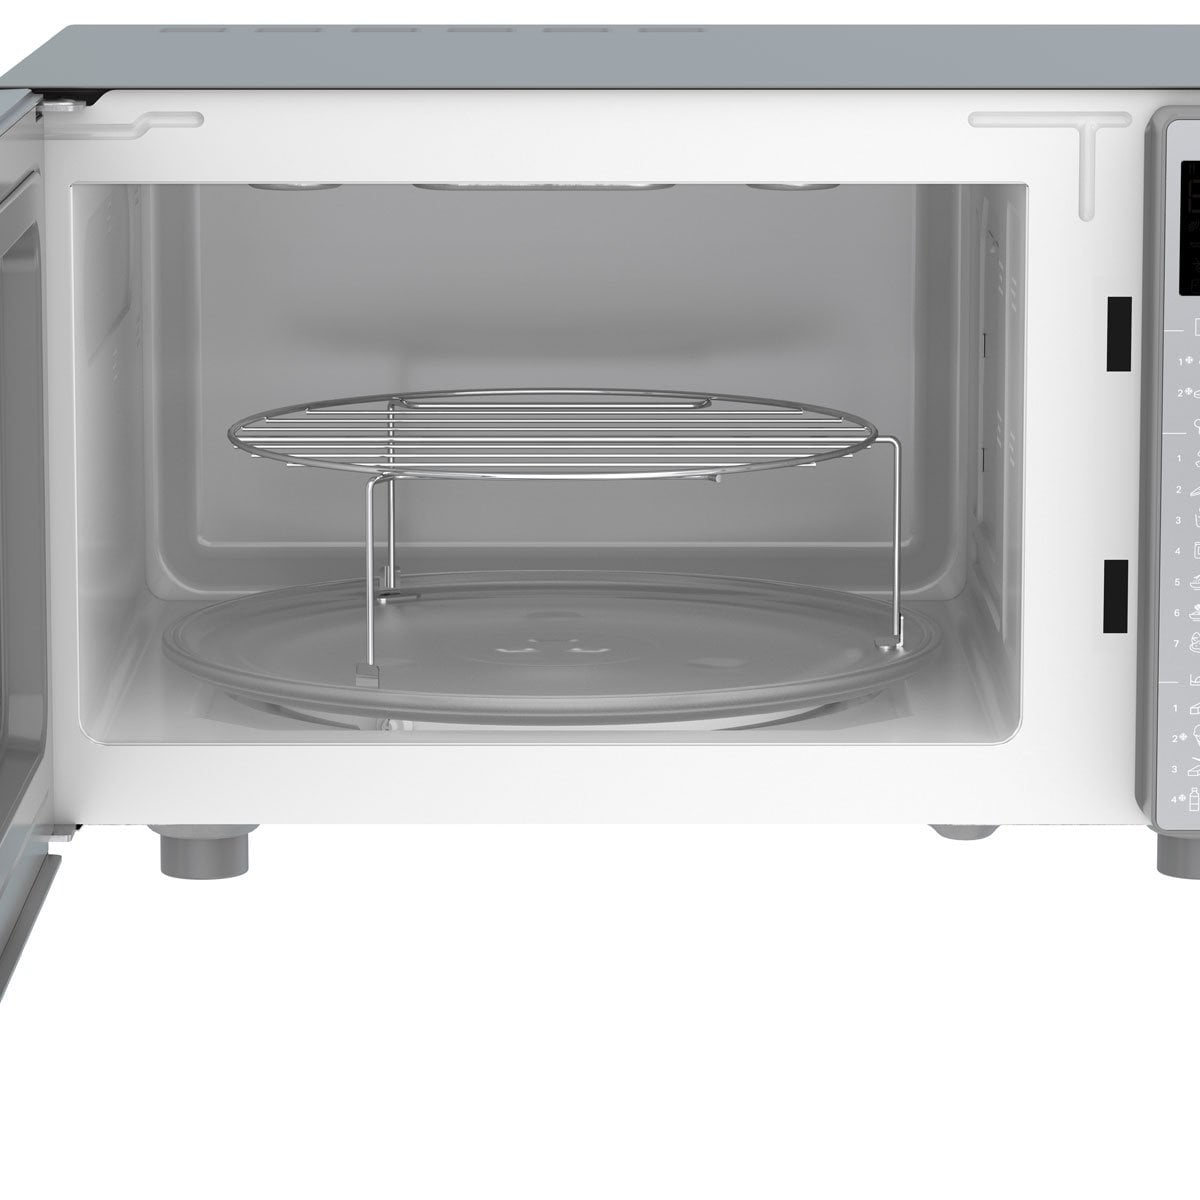 Microondas Whirlpool 1.1 P3 Wm2811D Silver